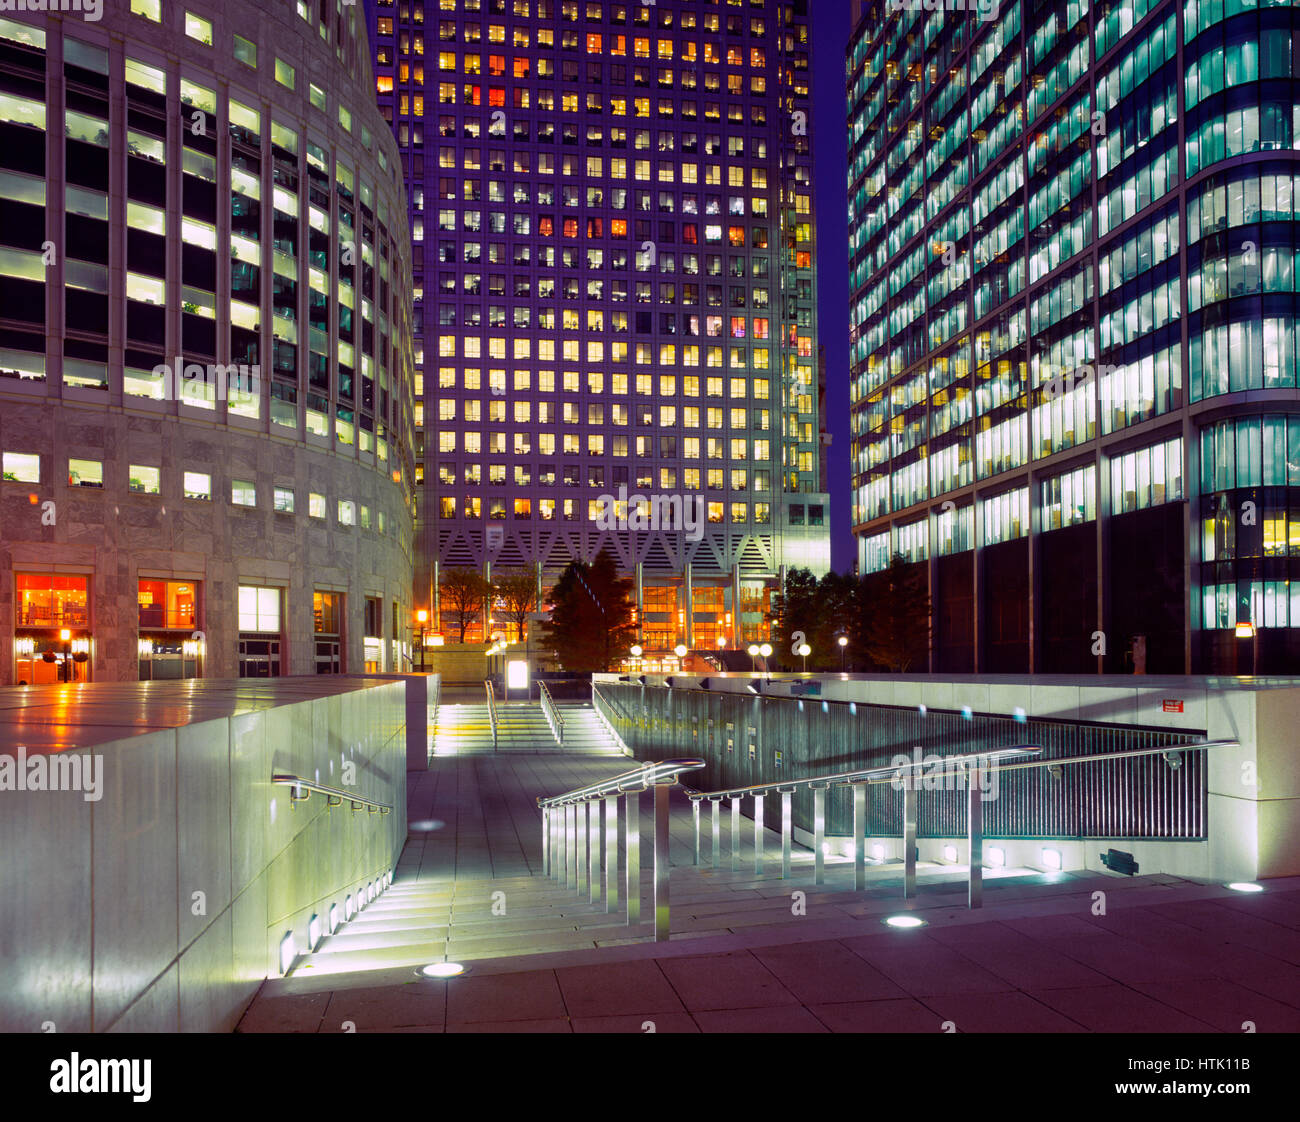 Canary Wharf Financial Centre, Docklands, London,England, UK. - Stock Image